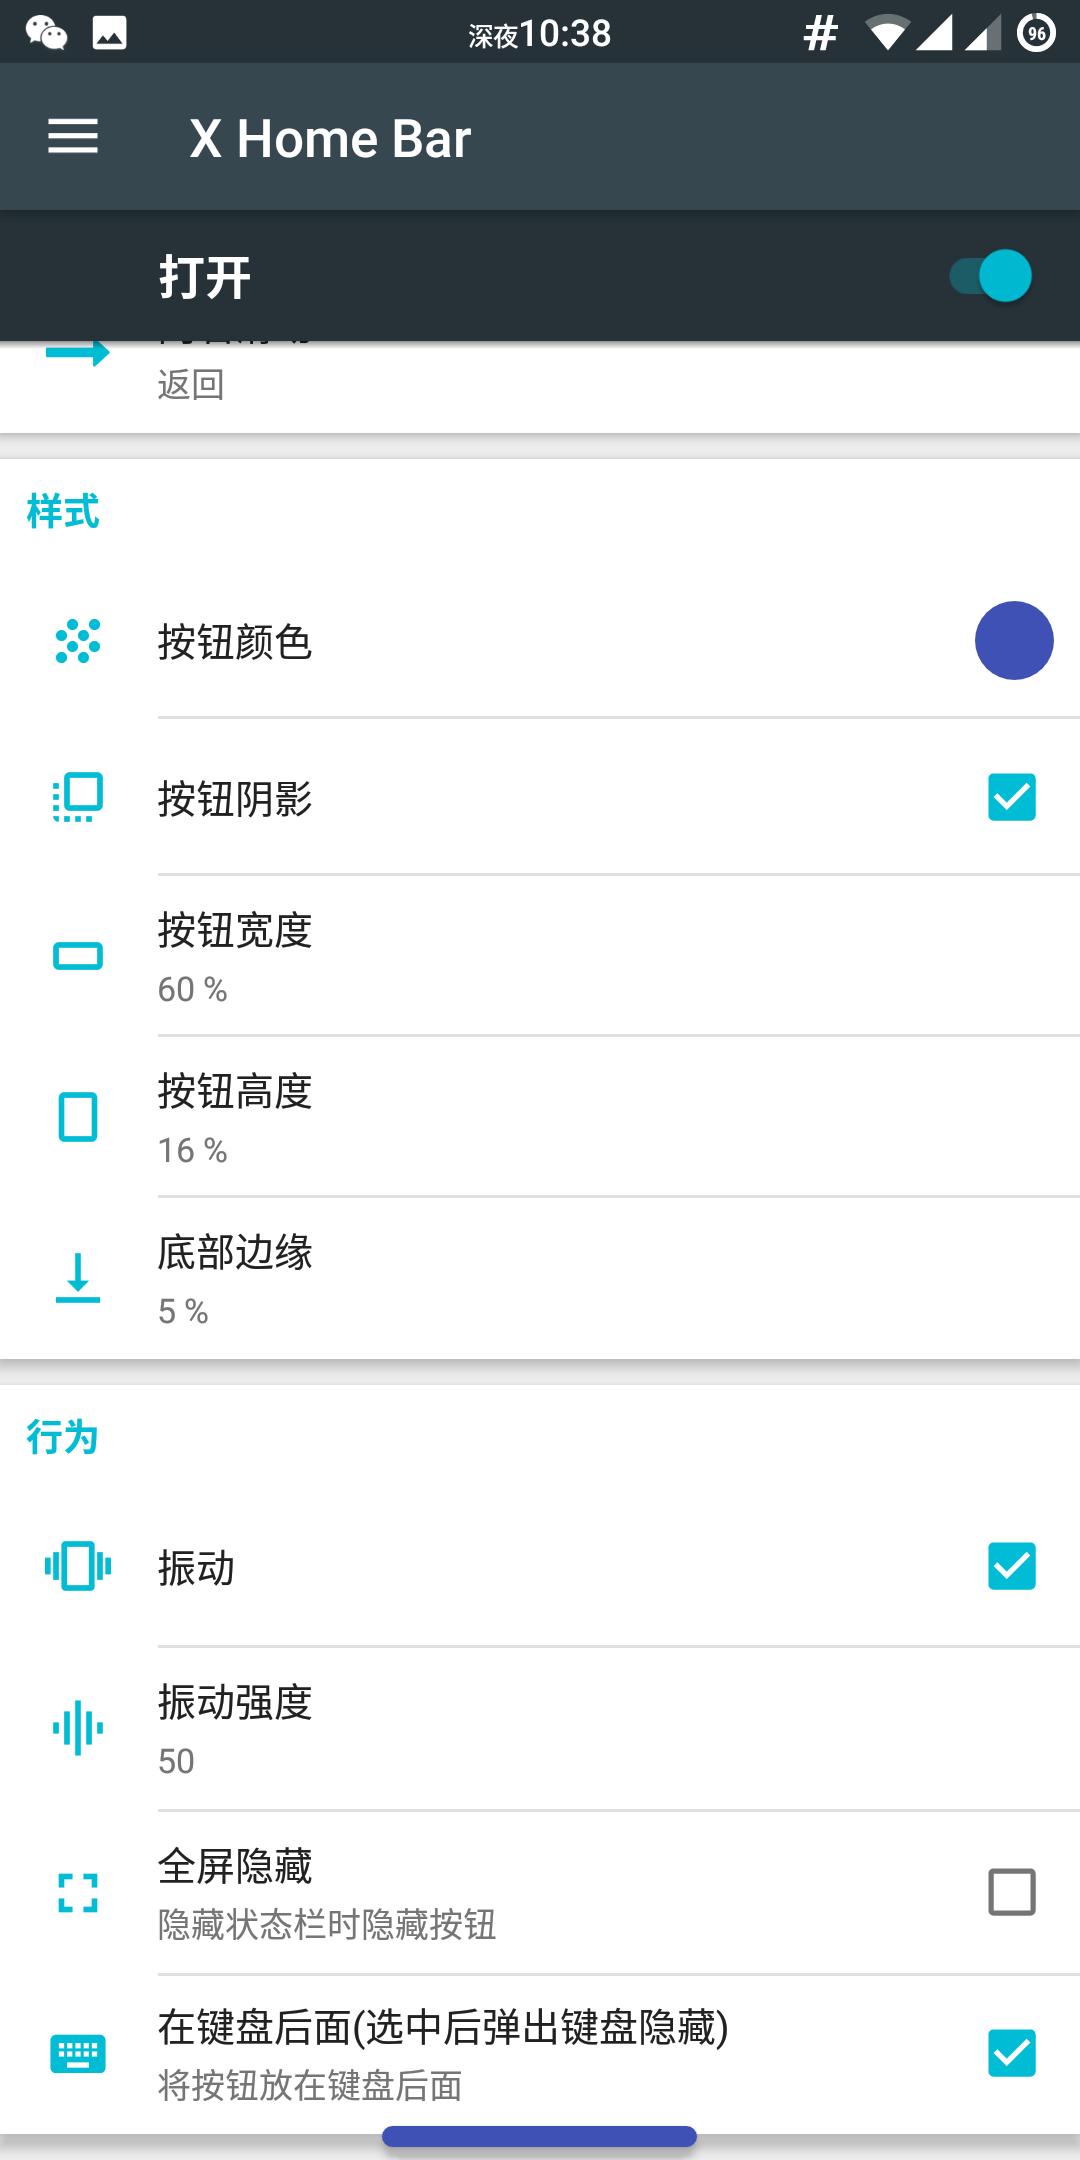 X Home Bar v 轻松开启苹果X的全屏手势 玩机专区 一加手机社区官方论坛